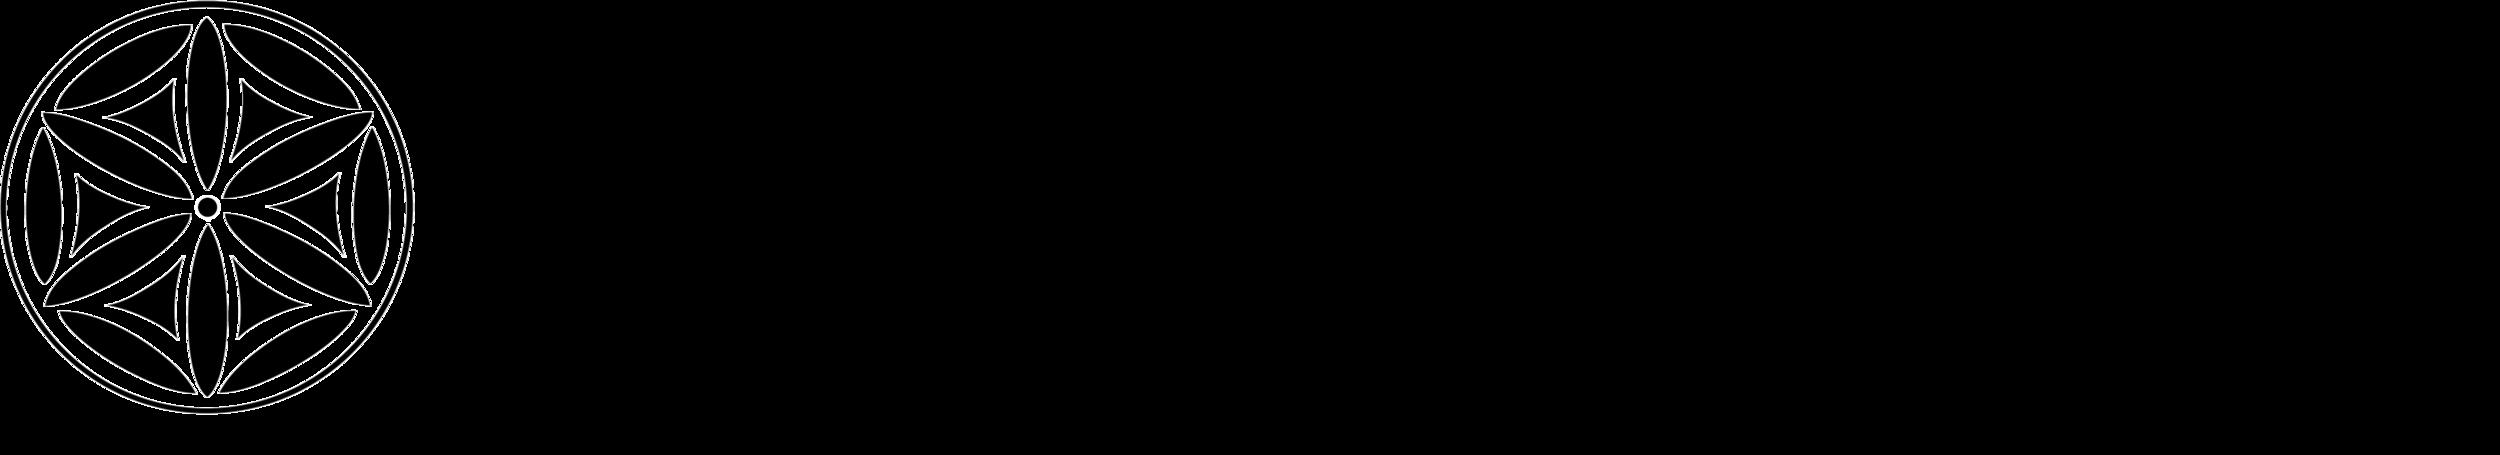 Showcase Logo Landscape.png